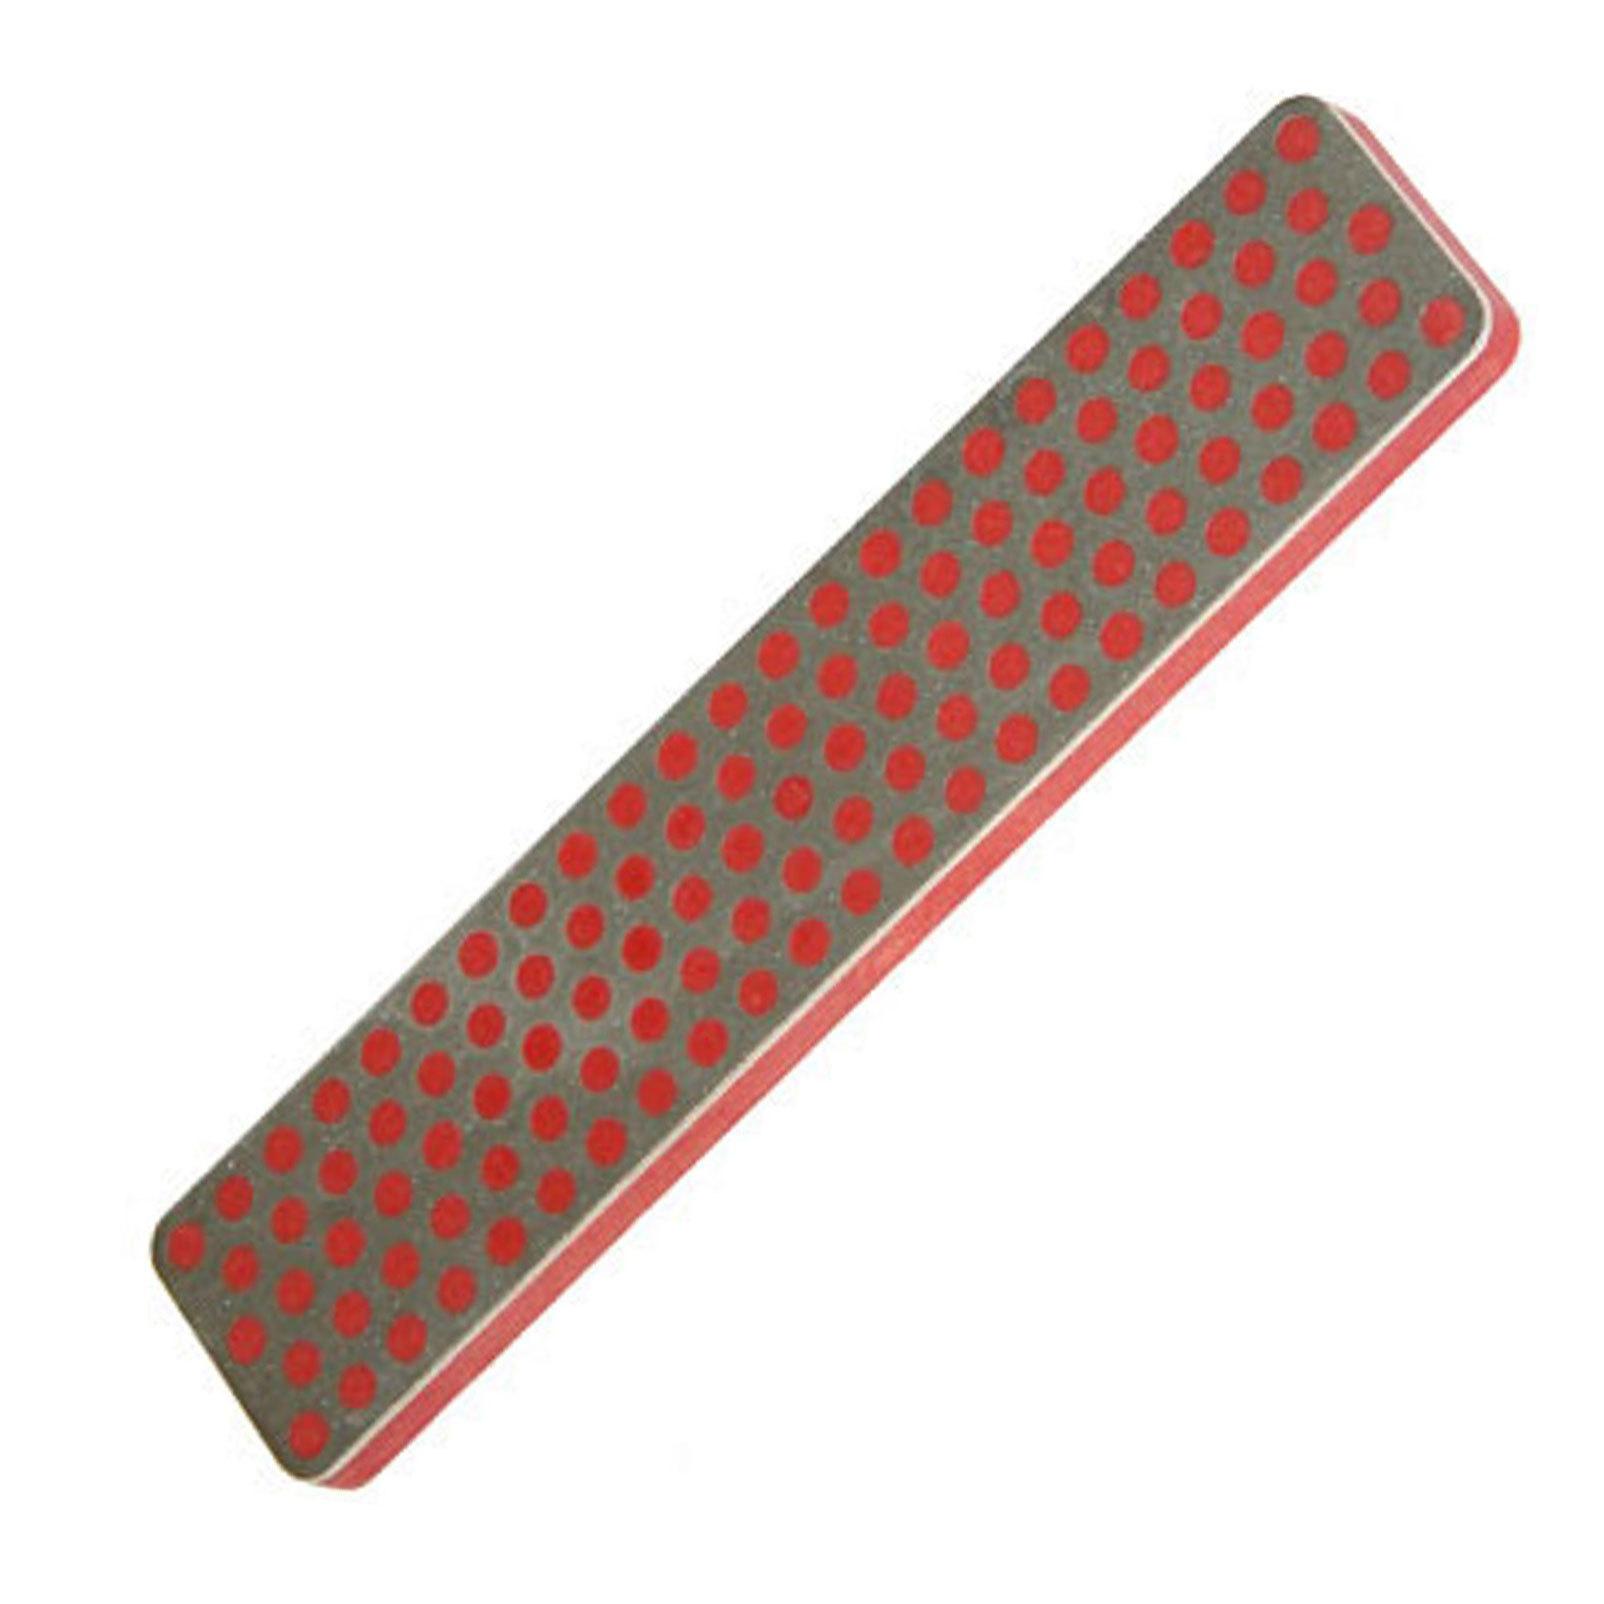 Фото 3 - Алмазный брусок DMT® Whetstone Fine, 600 mesh, 25 micron от DMT® Diamond Machining Technology